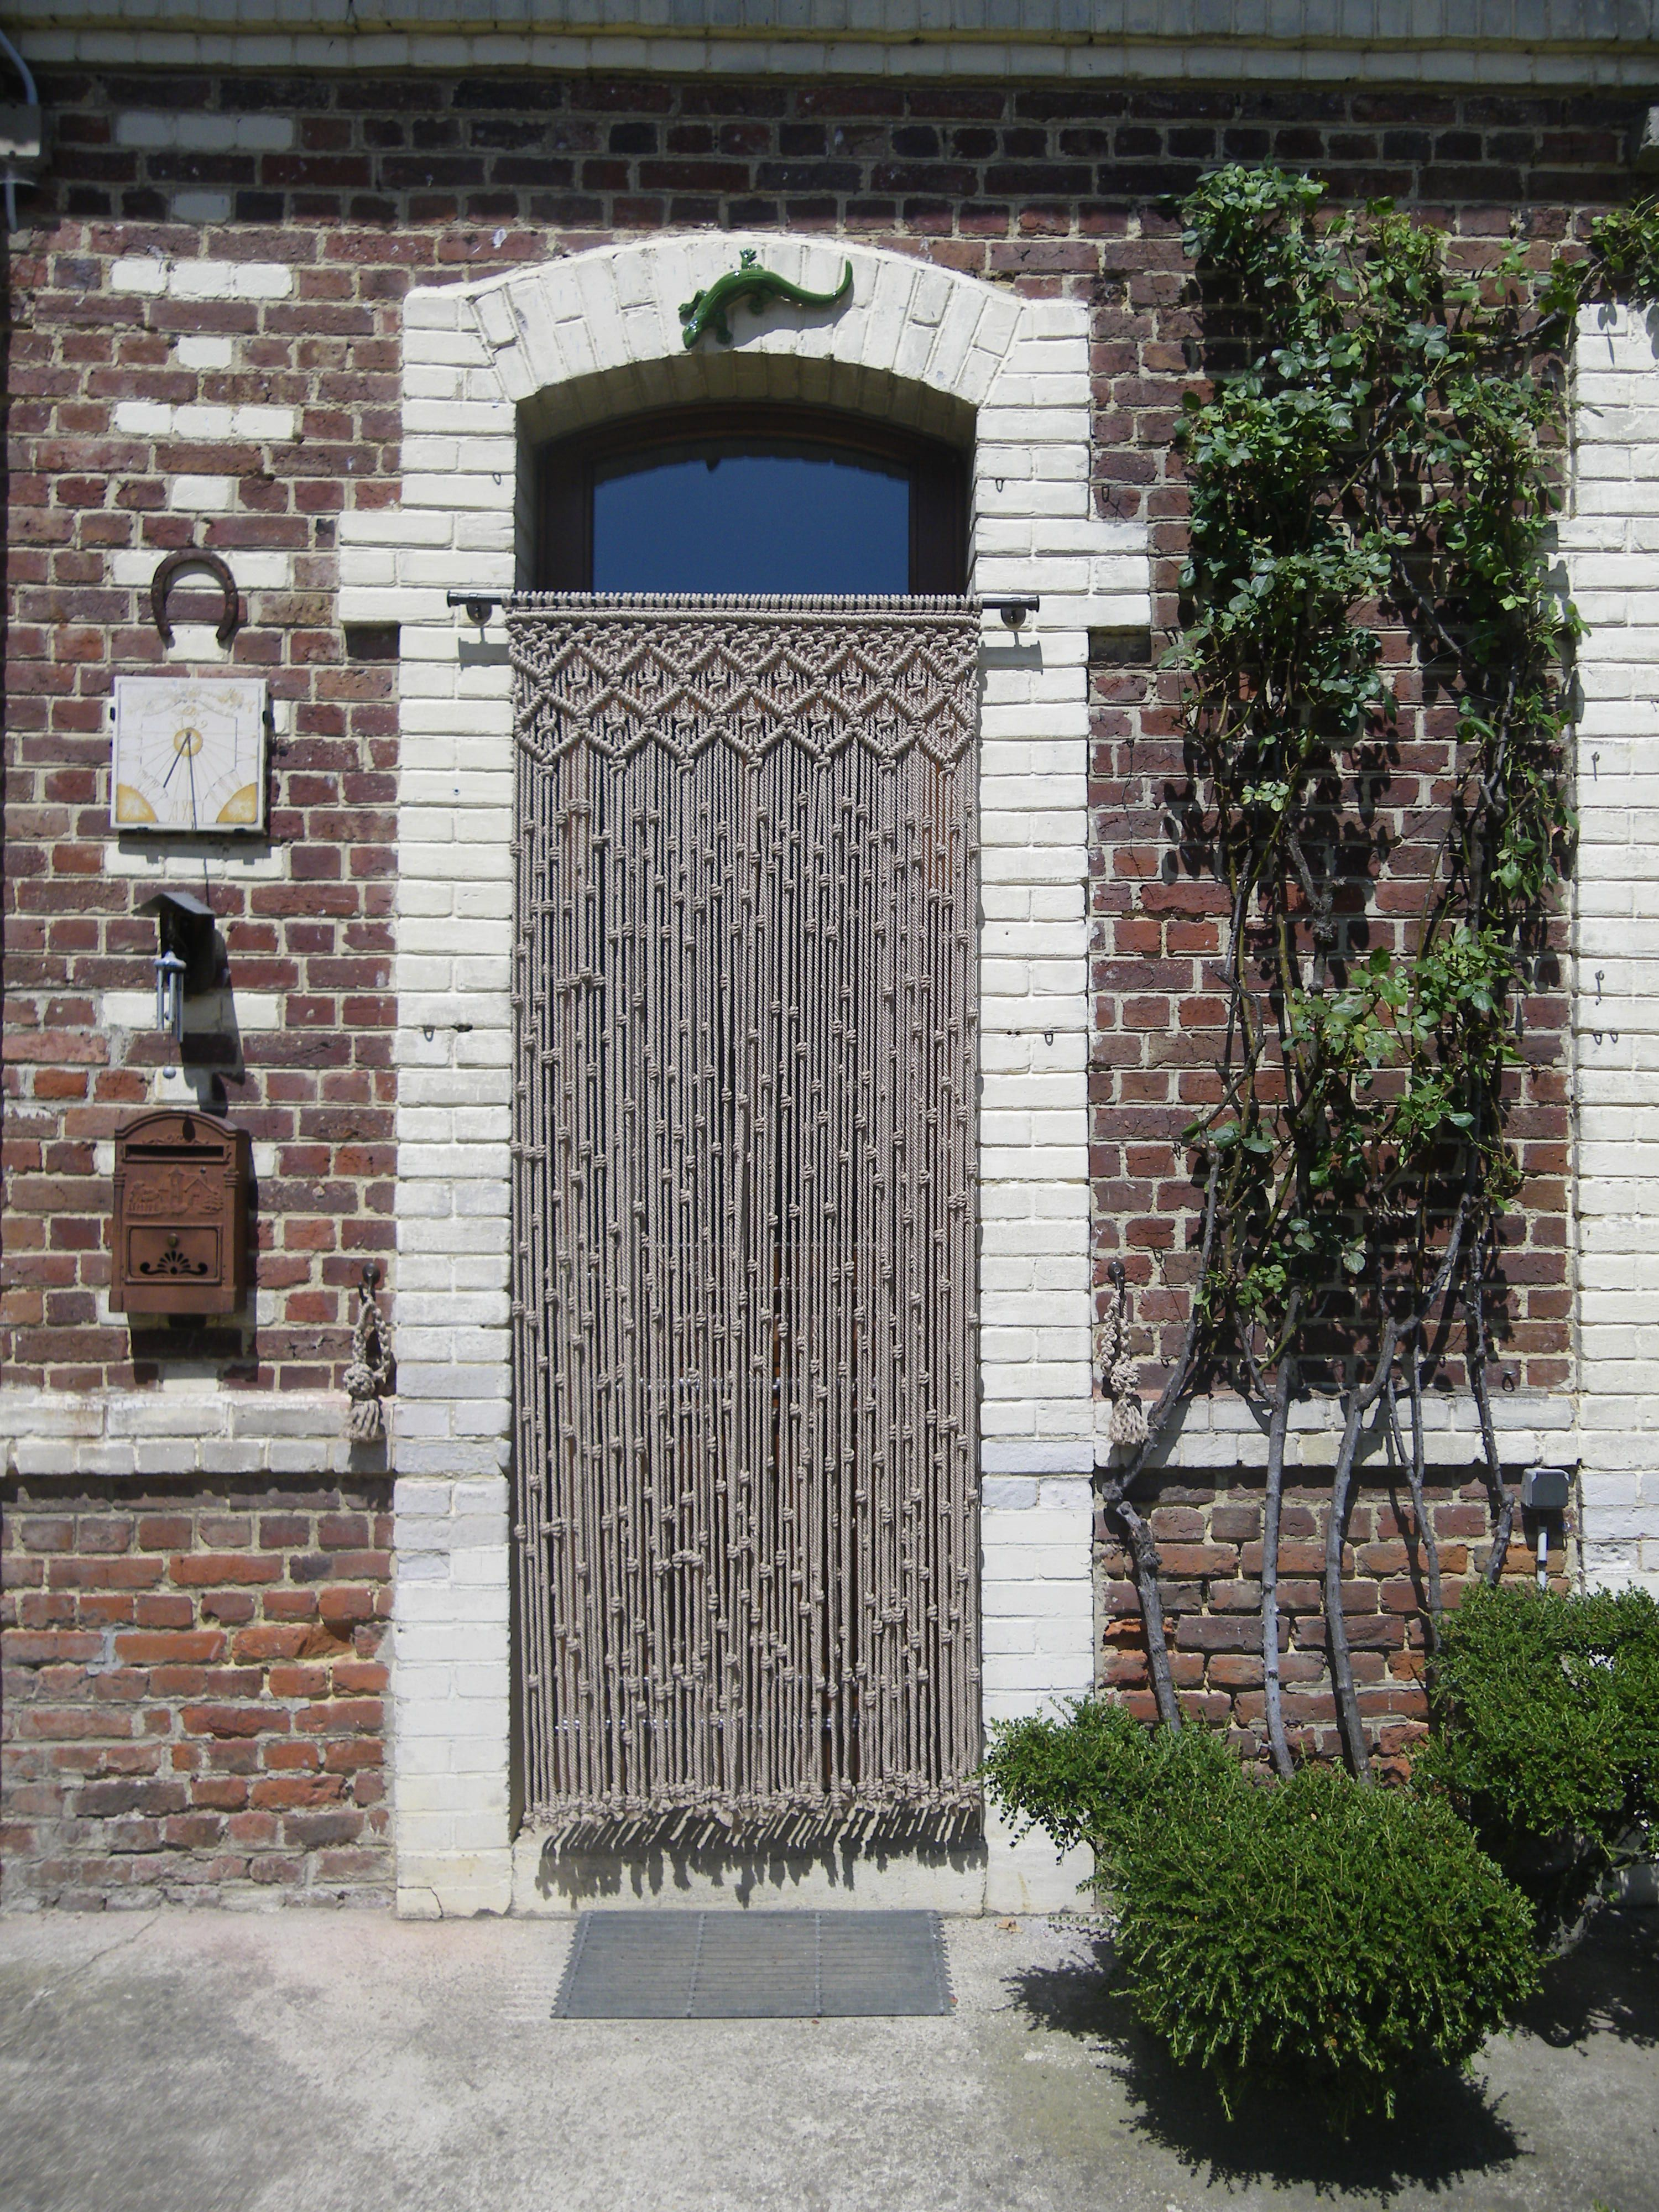 Cortina puerta exterior de macram cortinas para puertas - Cortinas para puertas exteriores ...